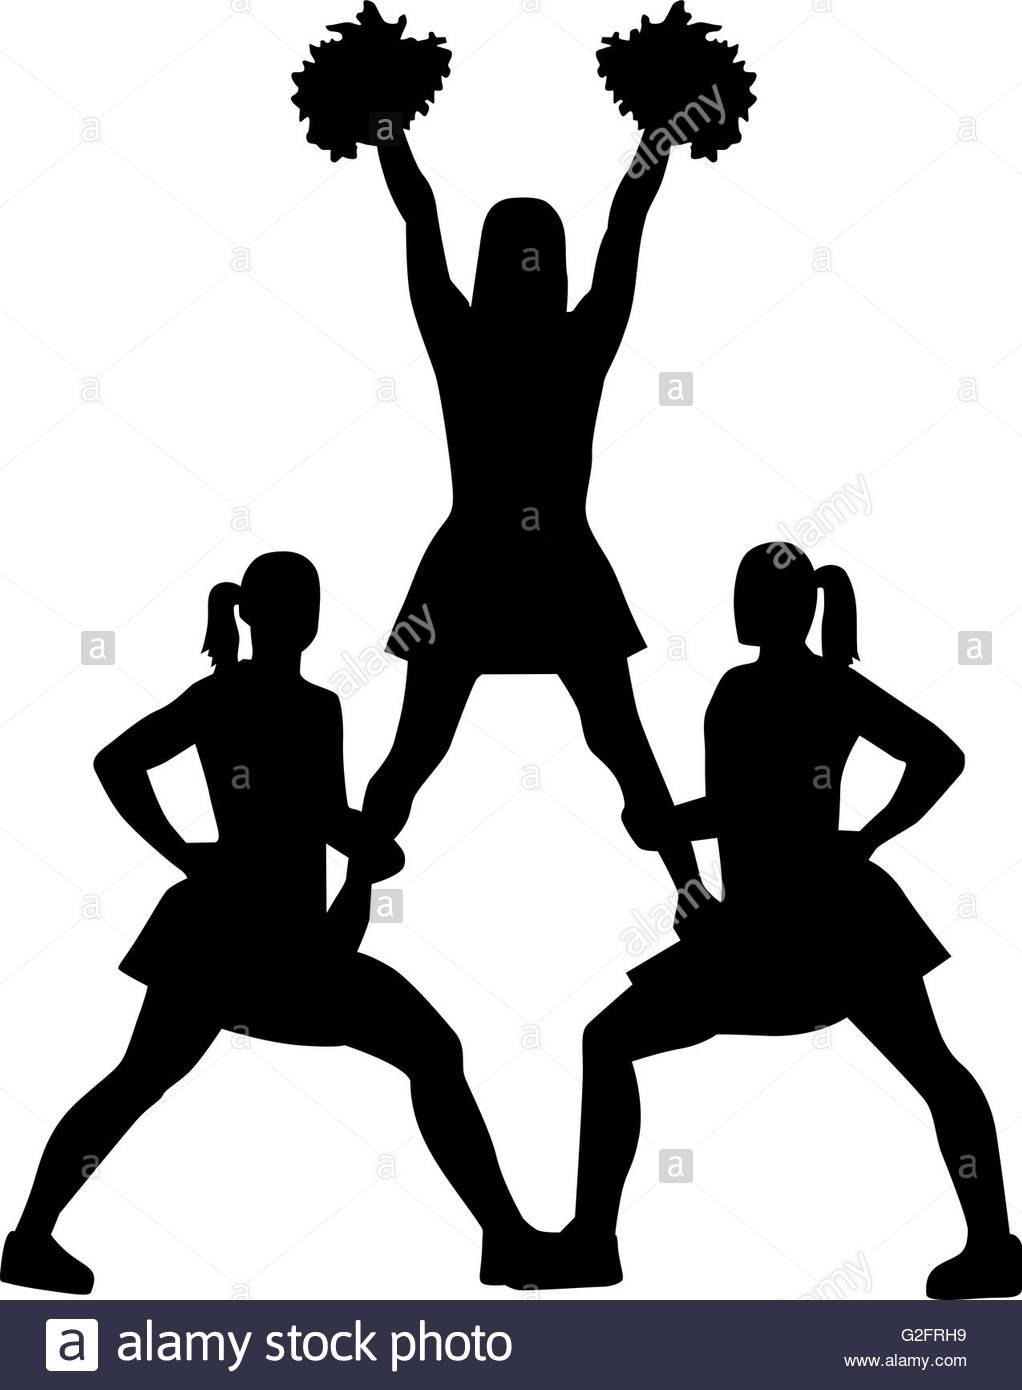 1022x1390 Cheerleading Pyramid Silhouette Stock Photo 104839317